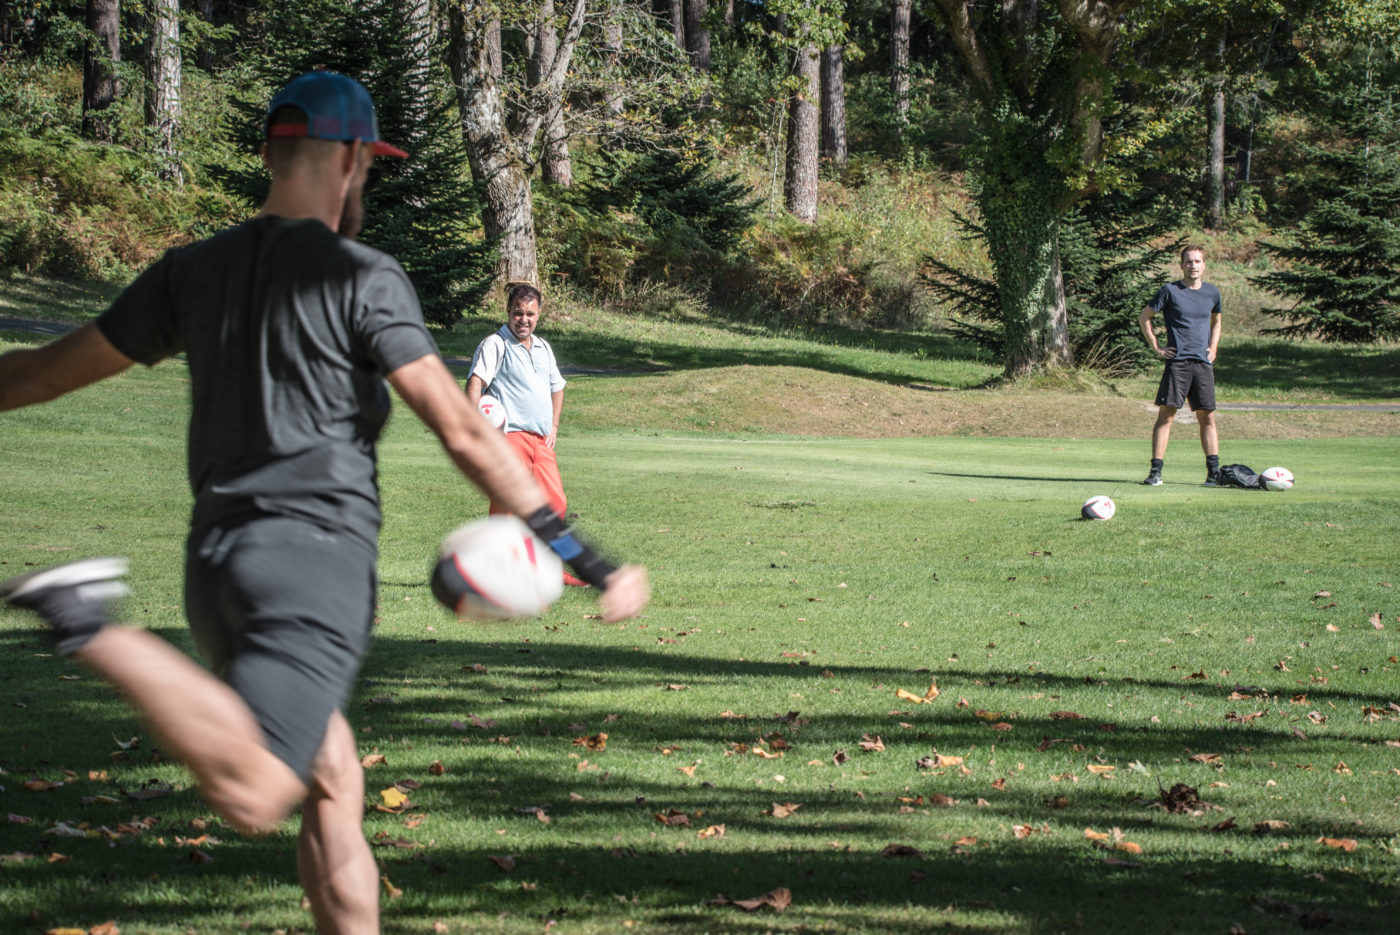 Événement Rugby Golf IRPB 2019 Chantaco Pays basque Agence Erronda